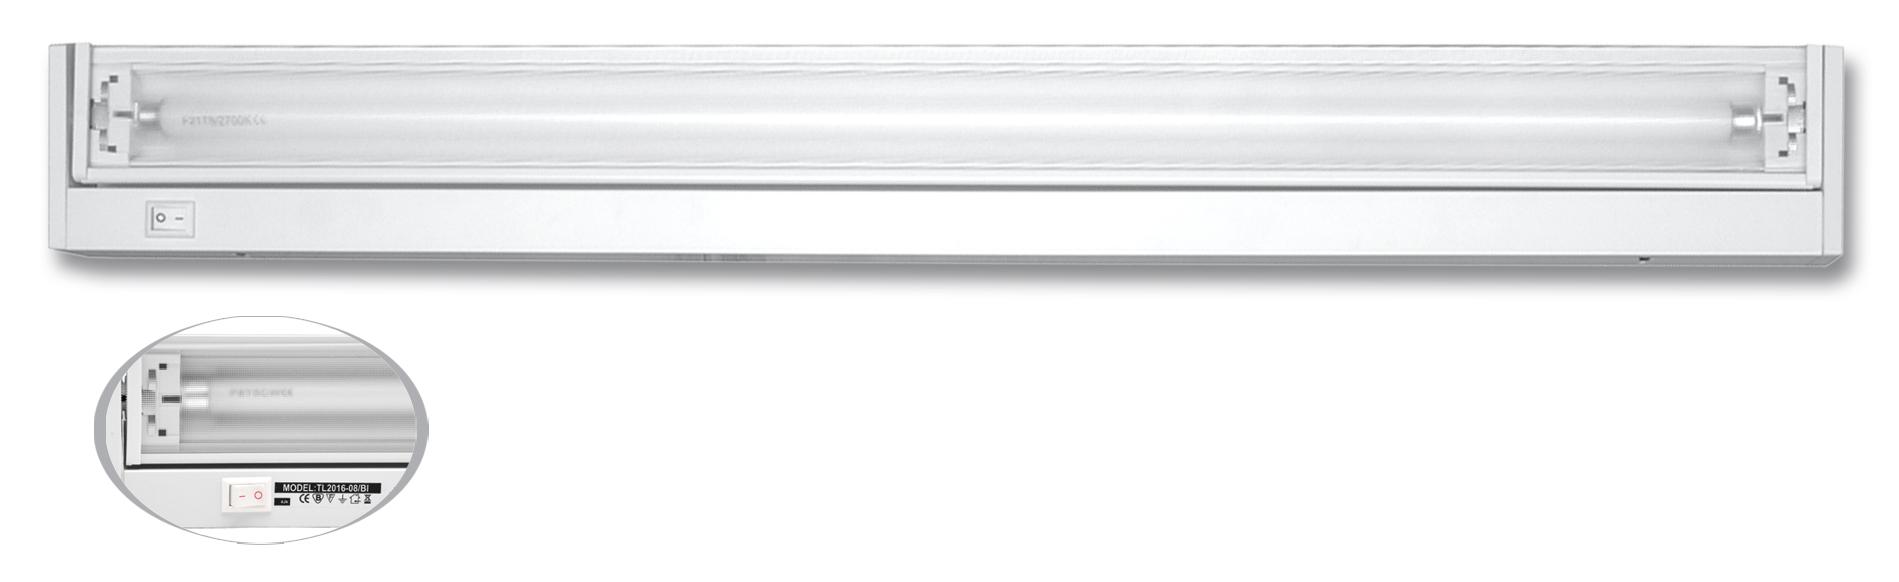 Ecolite TL2016-13/BI (Svietidlo žiarivkové 13W výklopné biele)